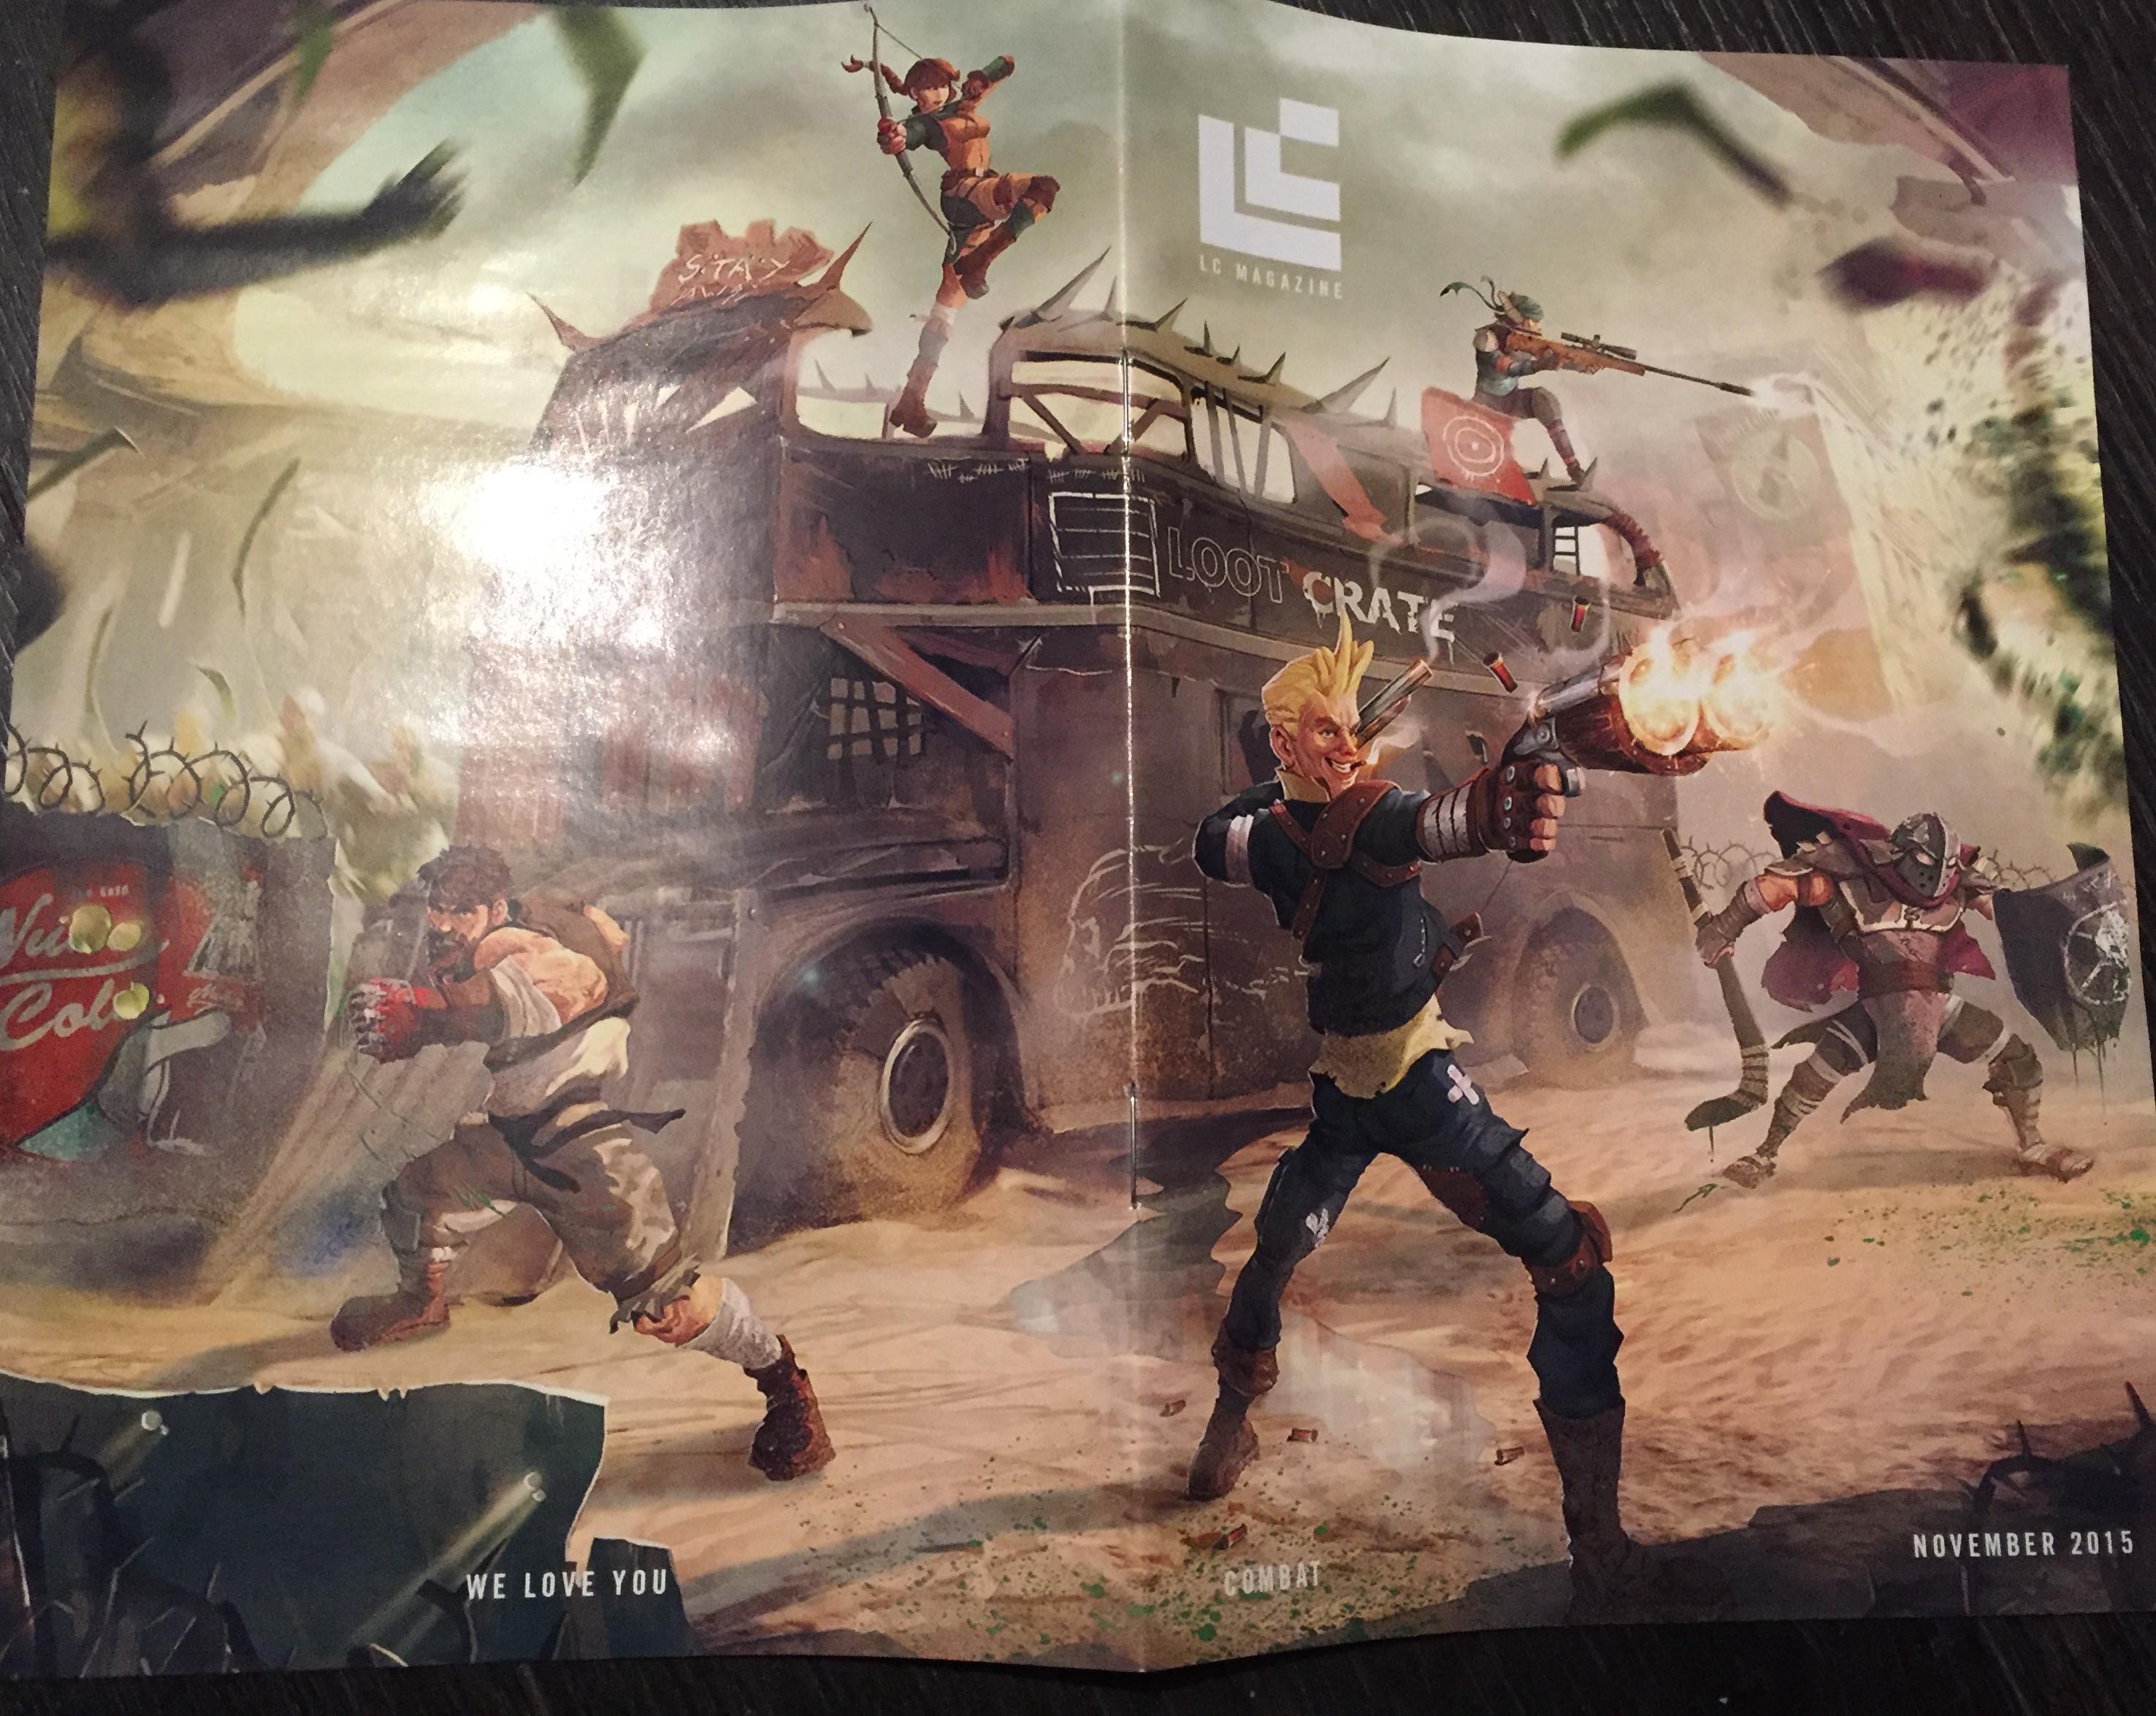 Loot Crate combat